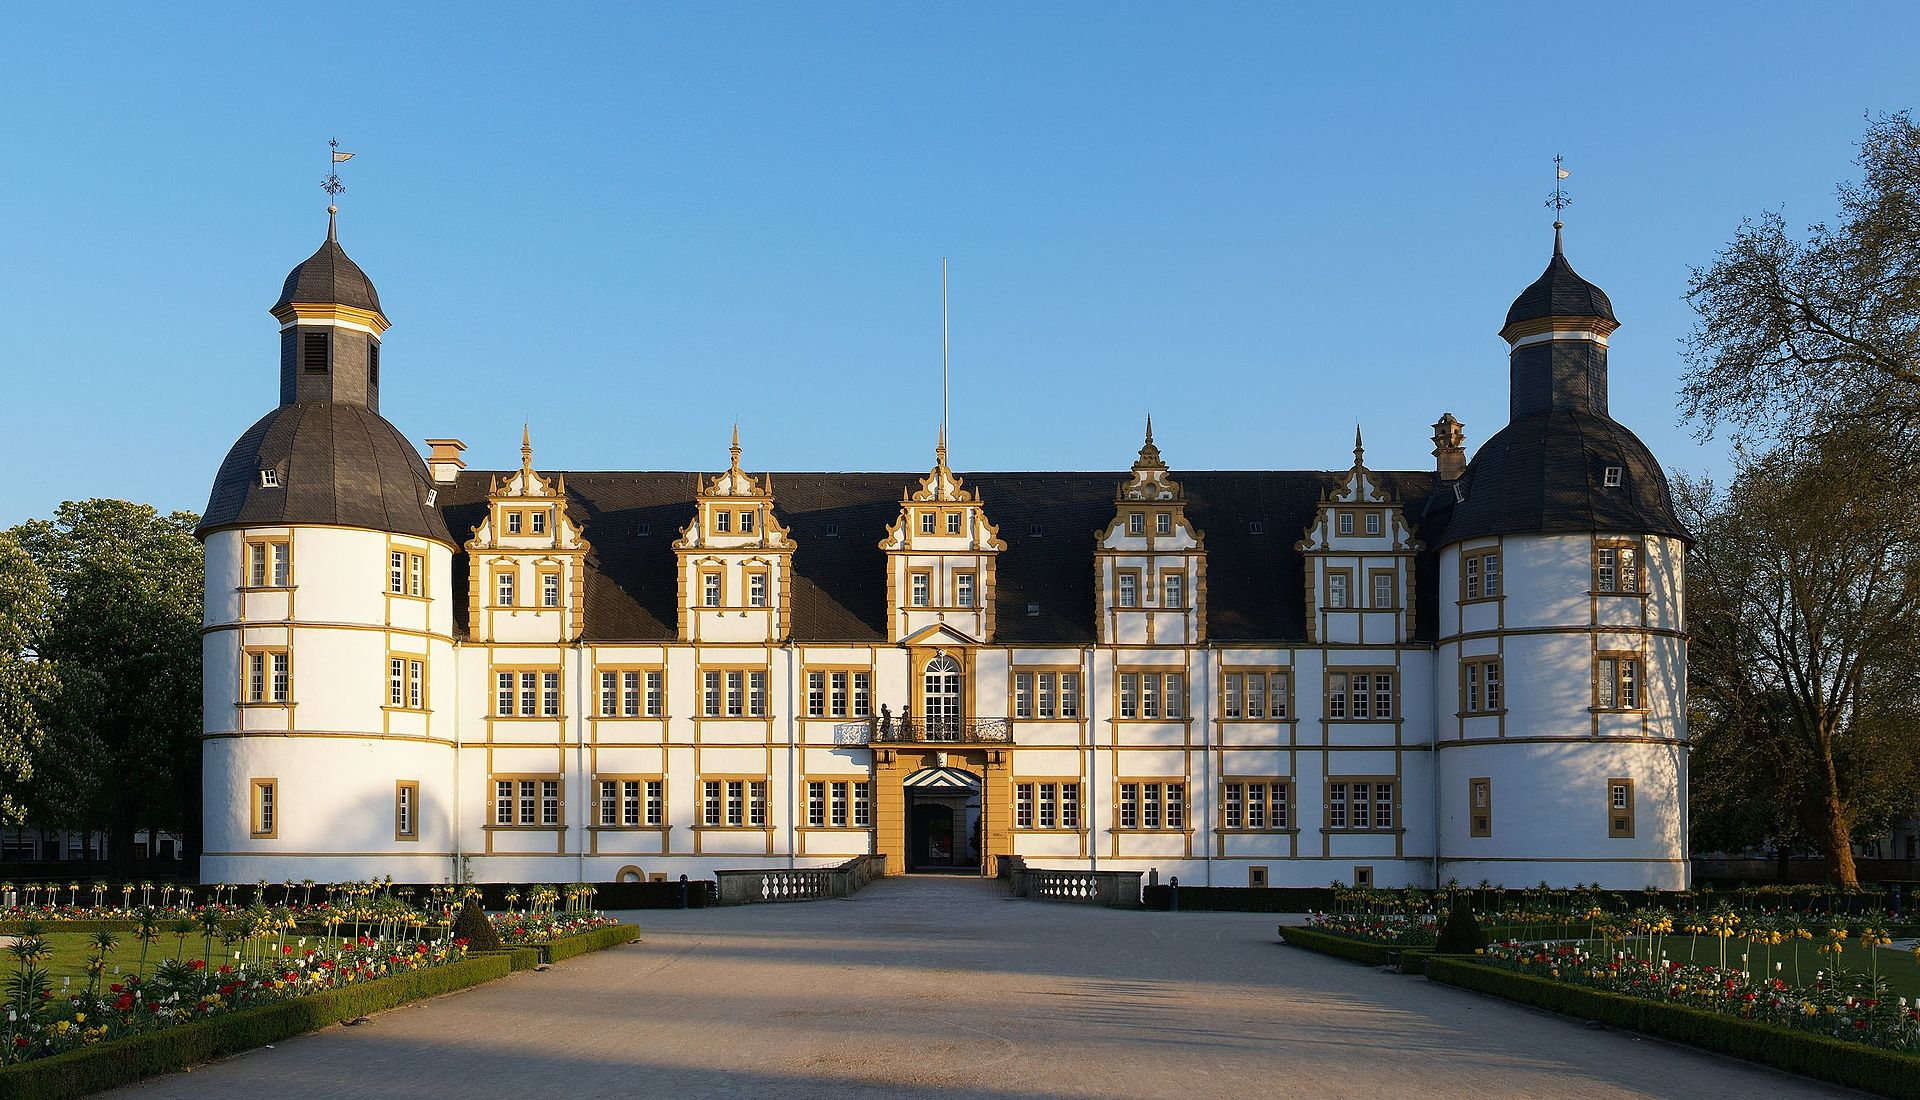 Bild Schloss Neuhaus Paderborn